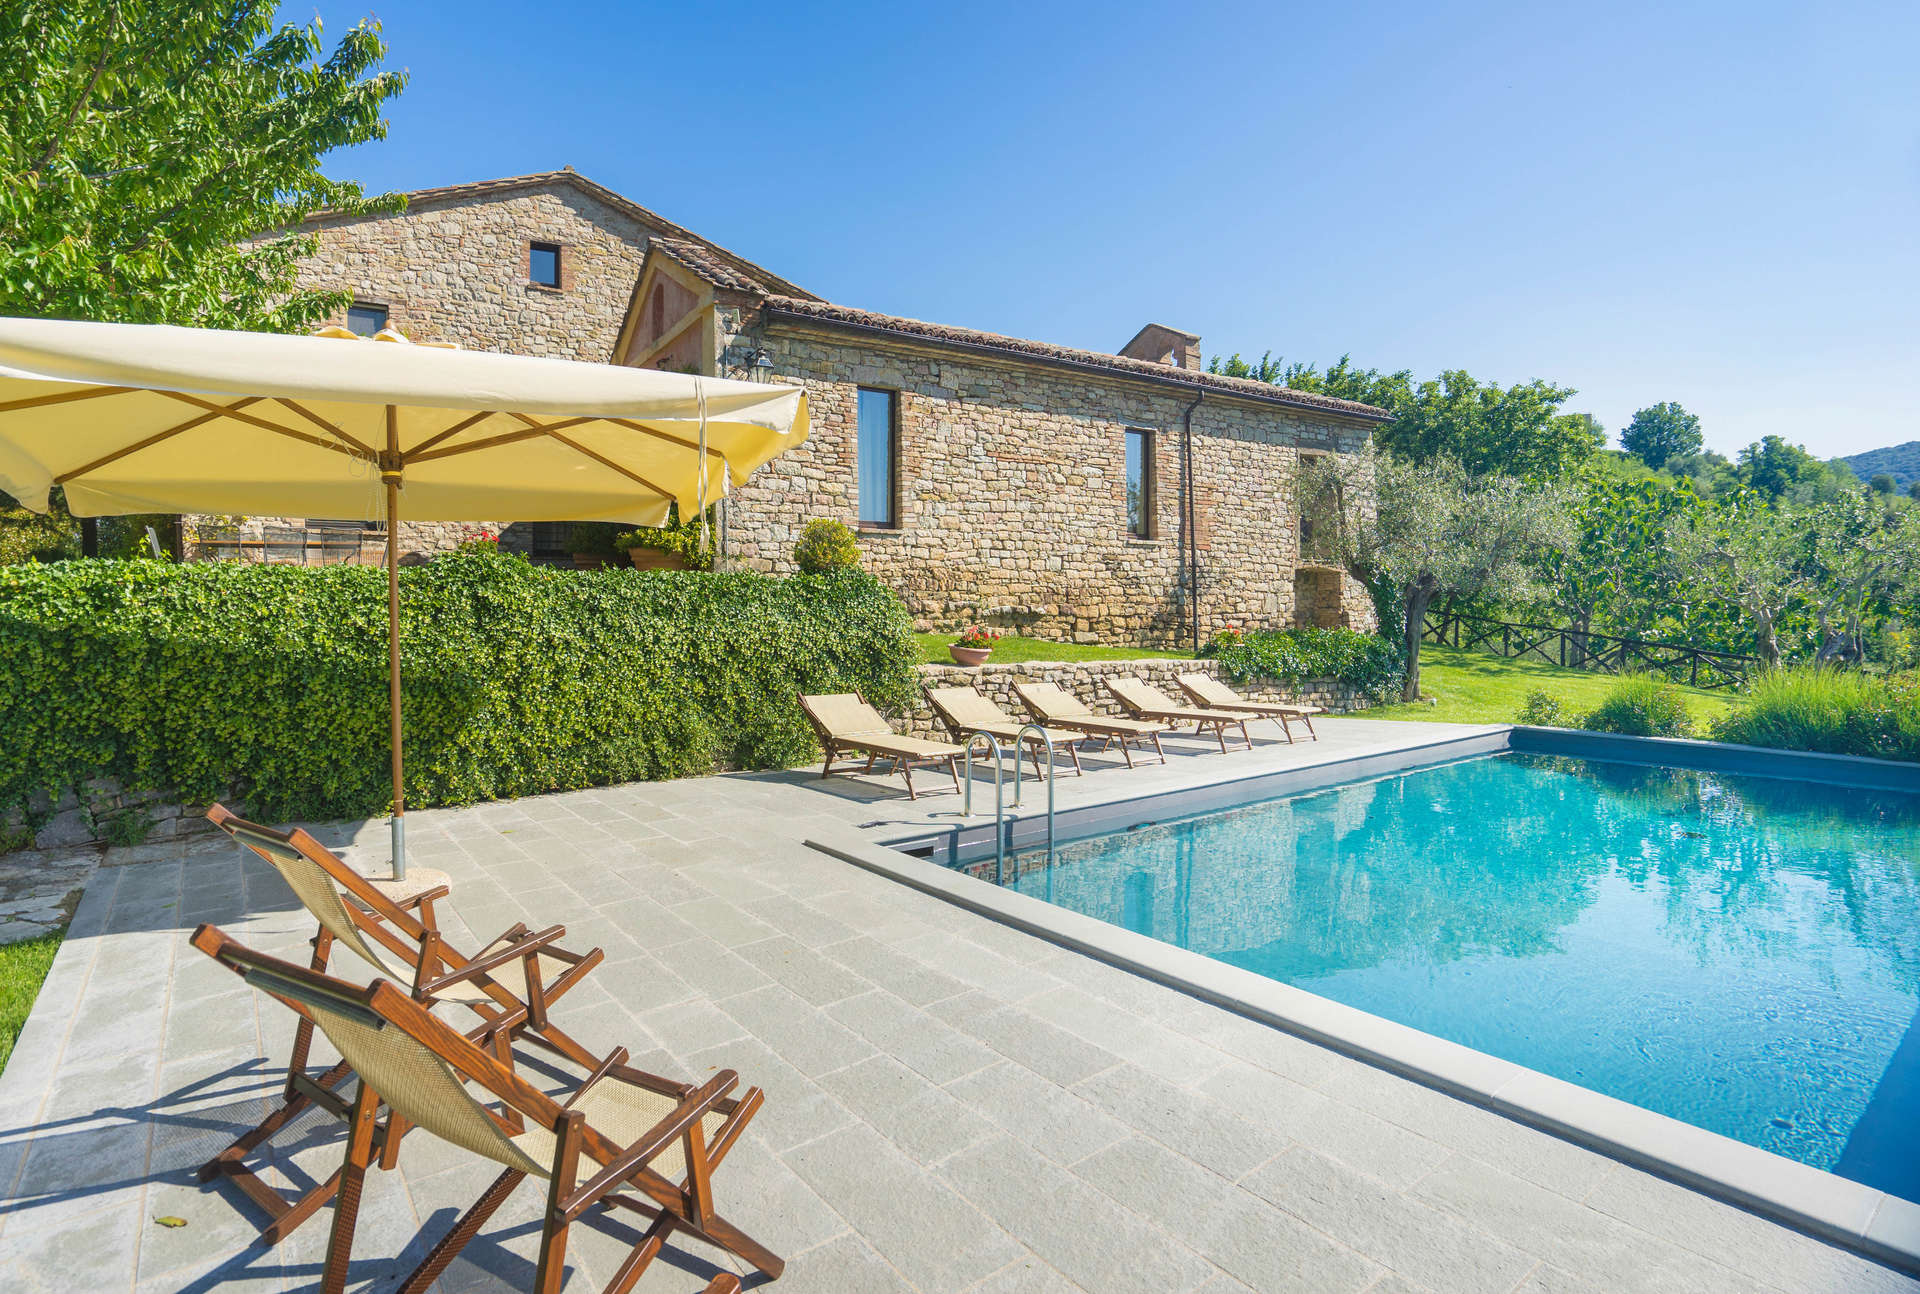 Luxury vacation rentals europe - Italy - Umbria - San giovanni del pantano - Jaja - Image 1/15